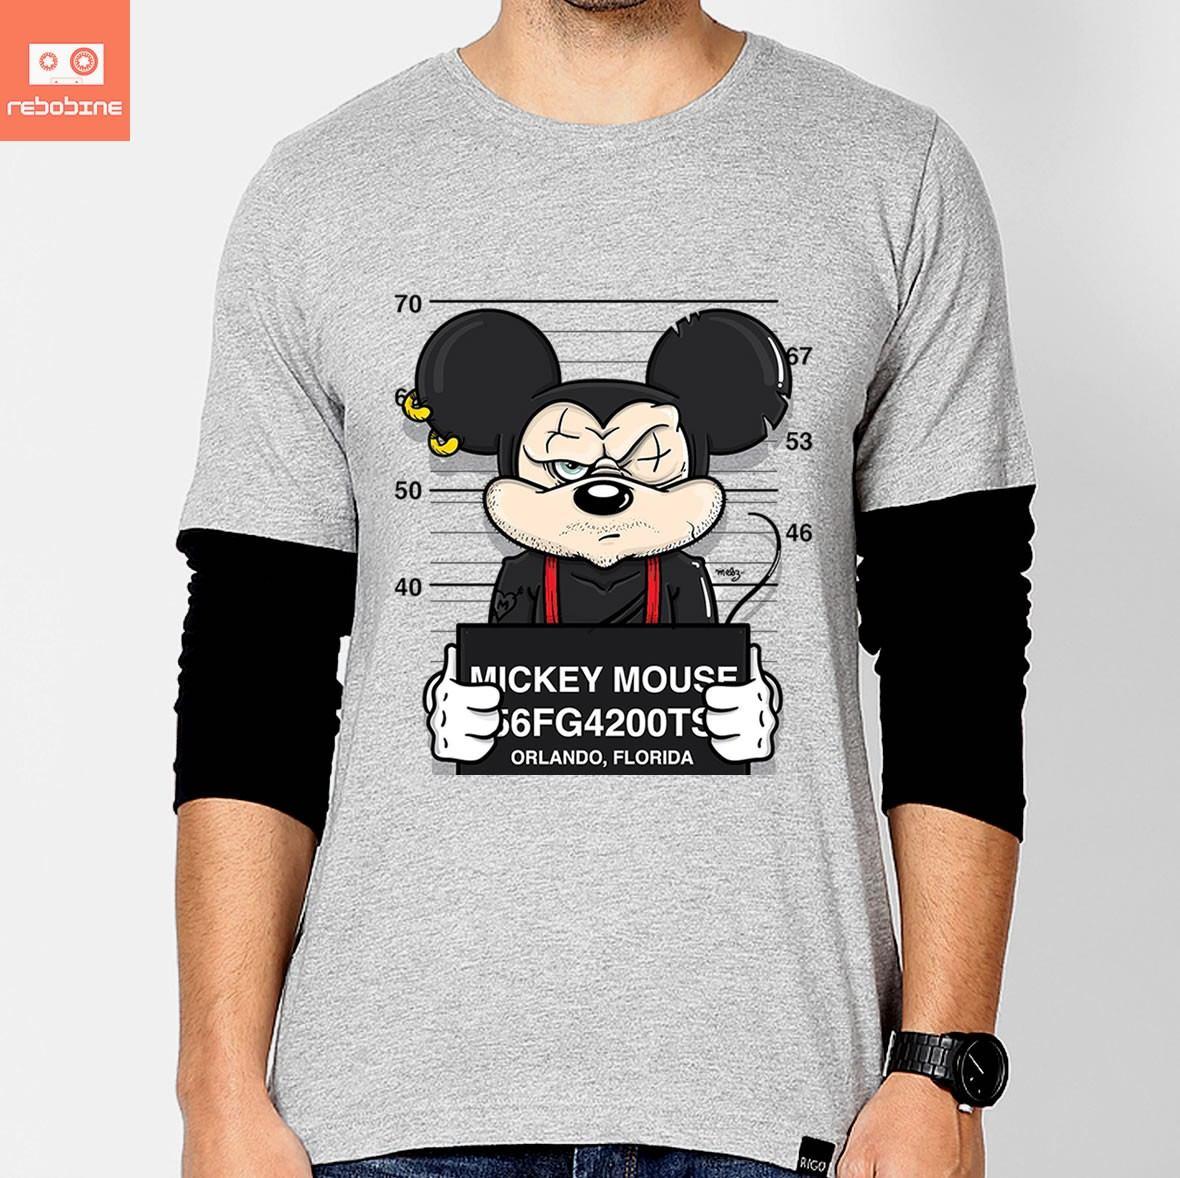 Camisetas Mickey Disney Bad Desenhos Animados Cinema Camisa - R  49 ... 41975d93c763d